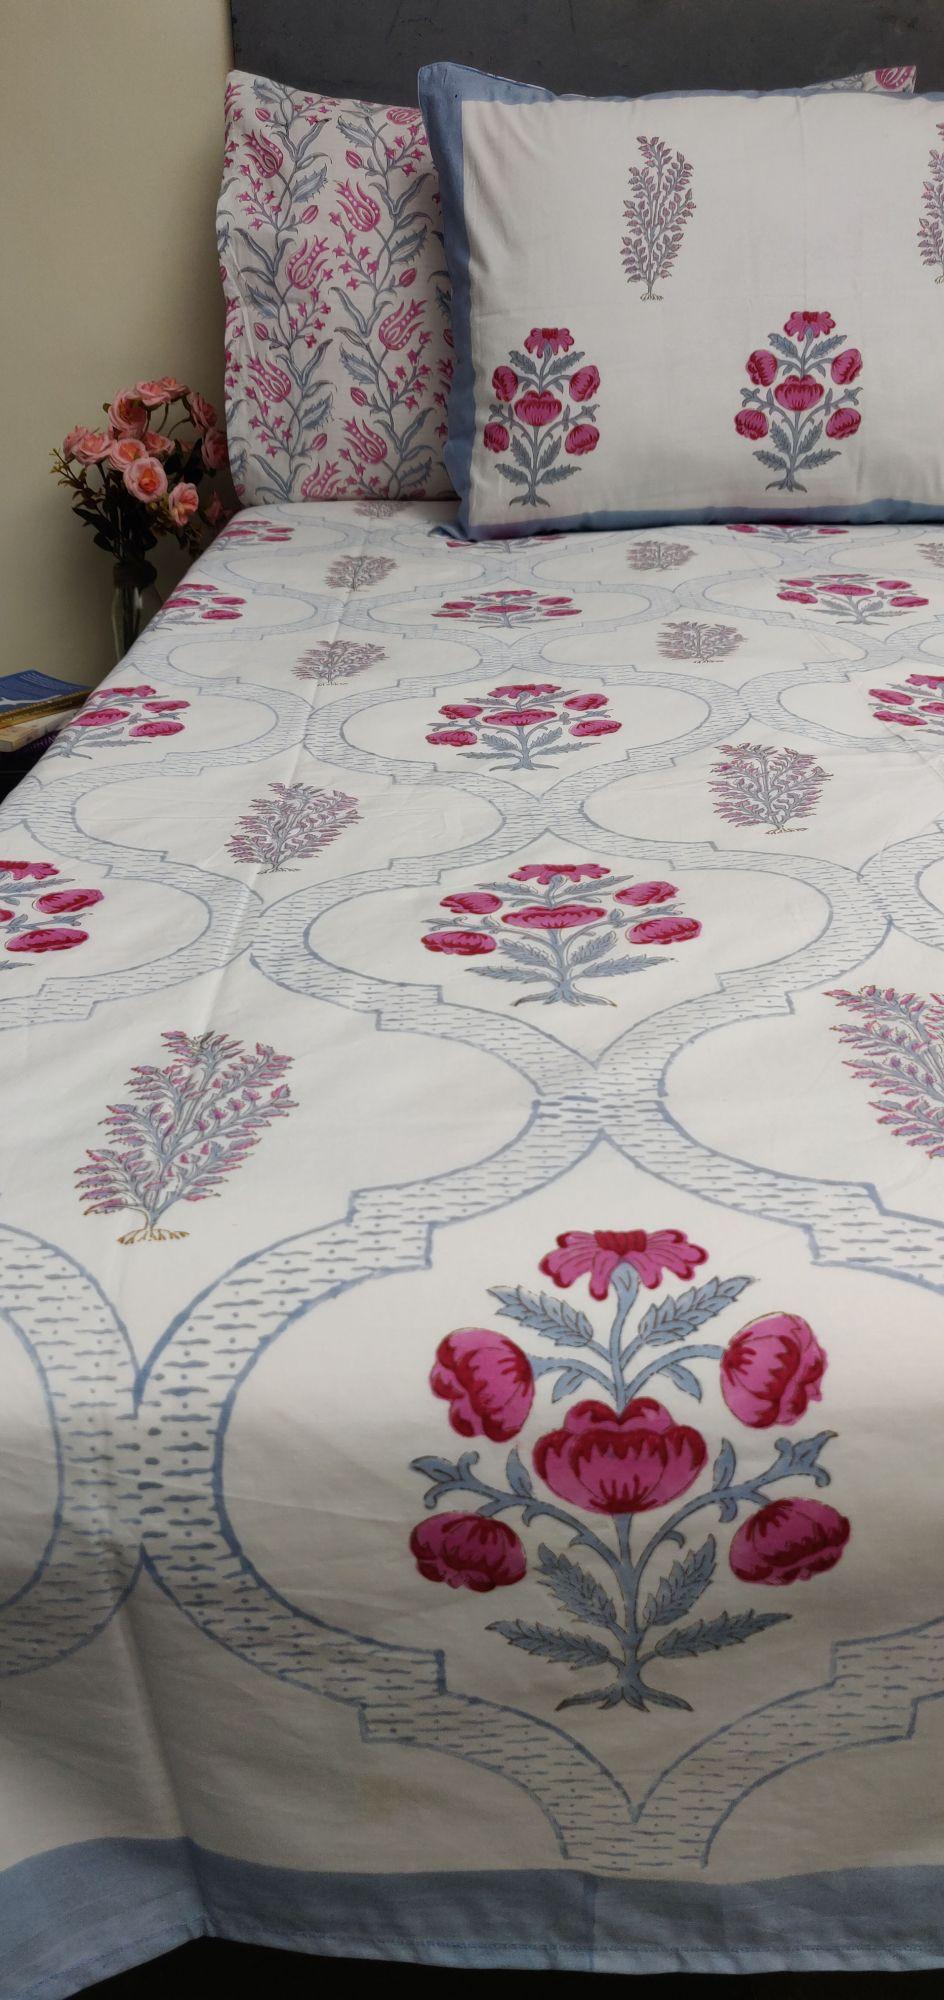 Floral Boota King Bedsheet BHK45